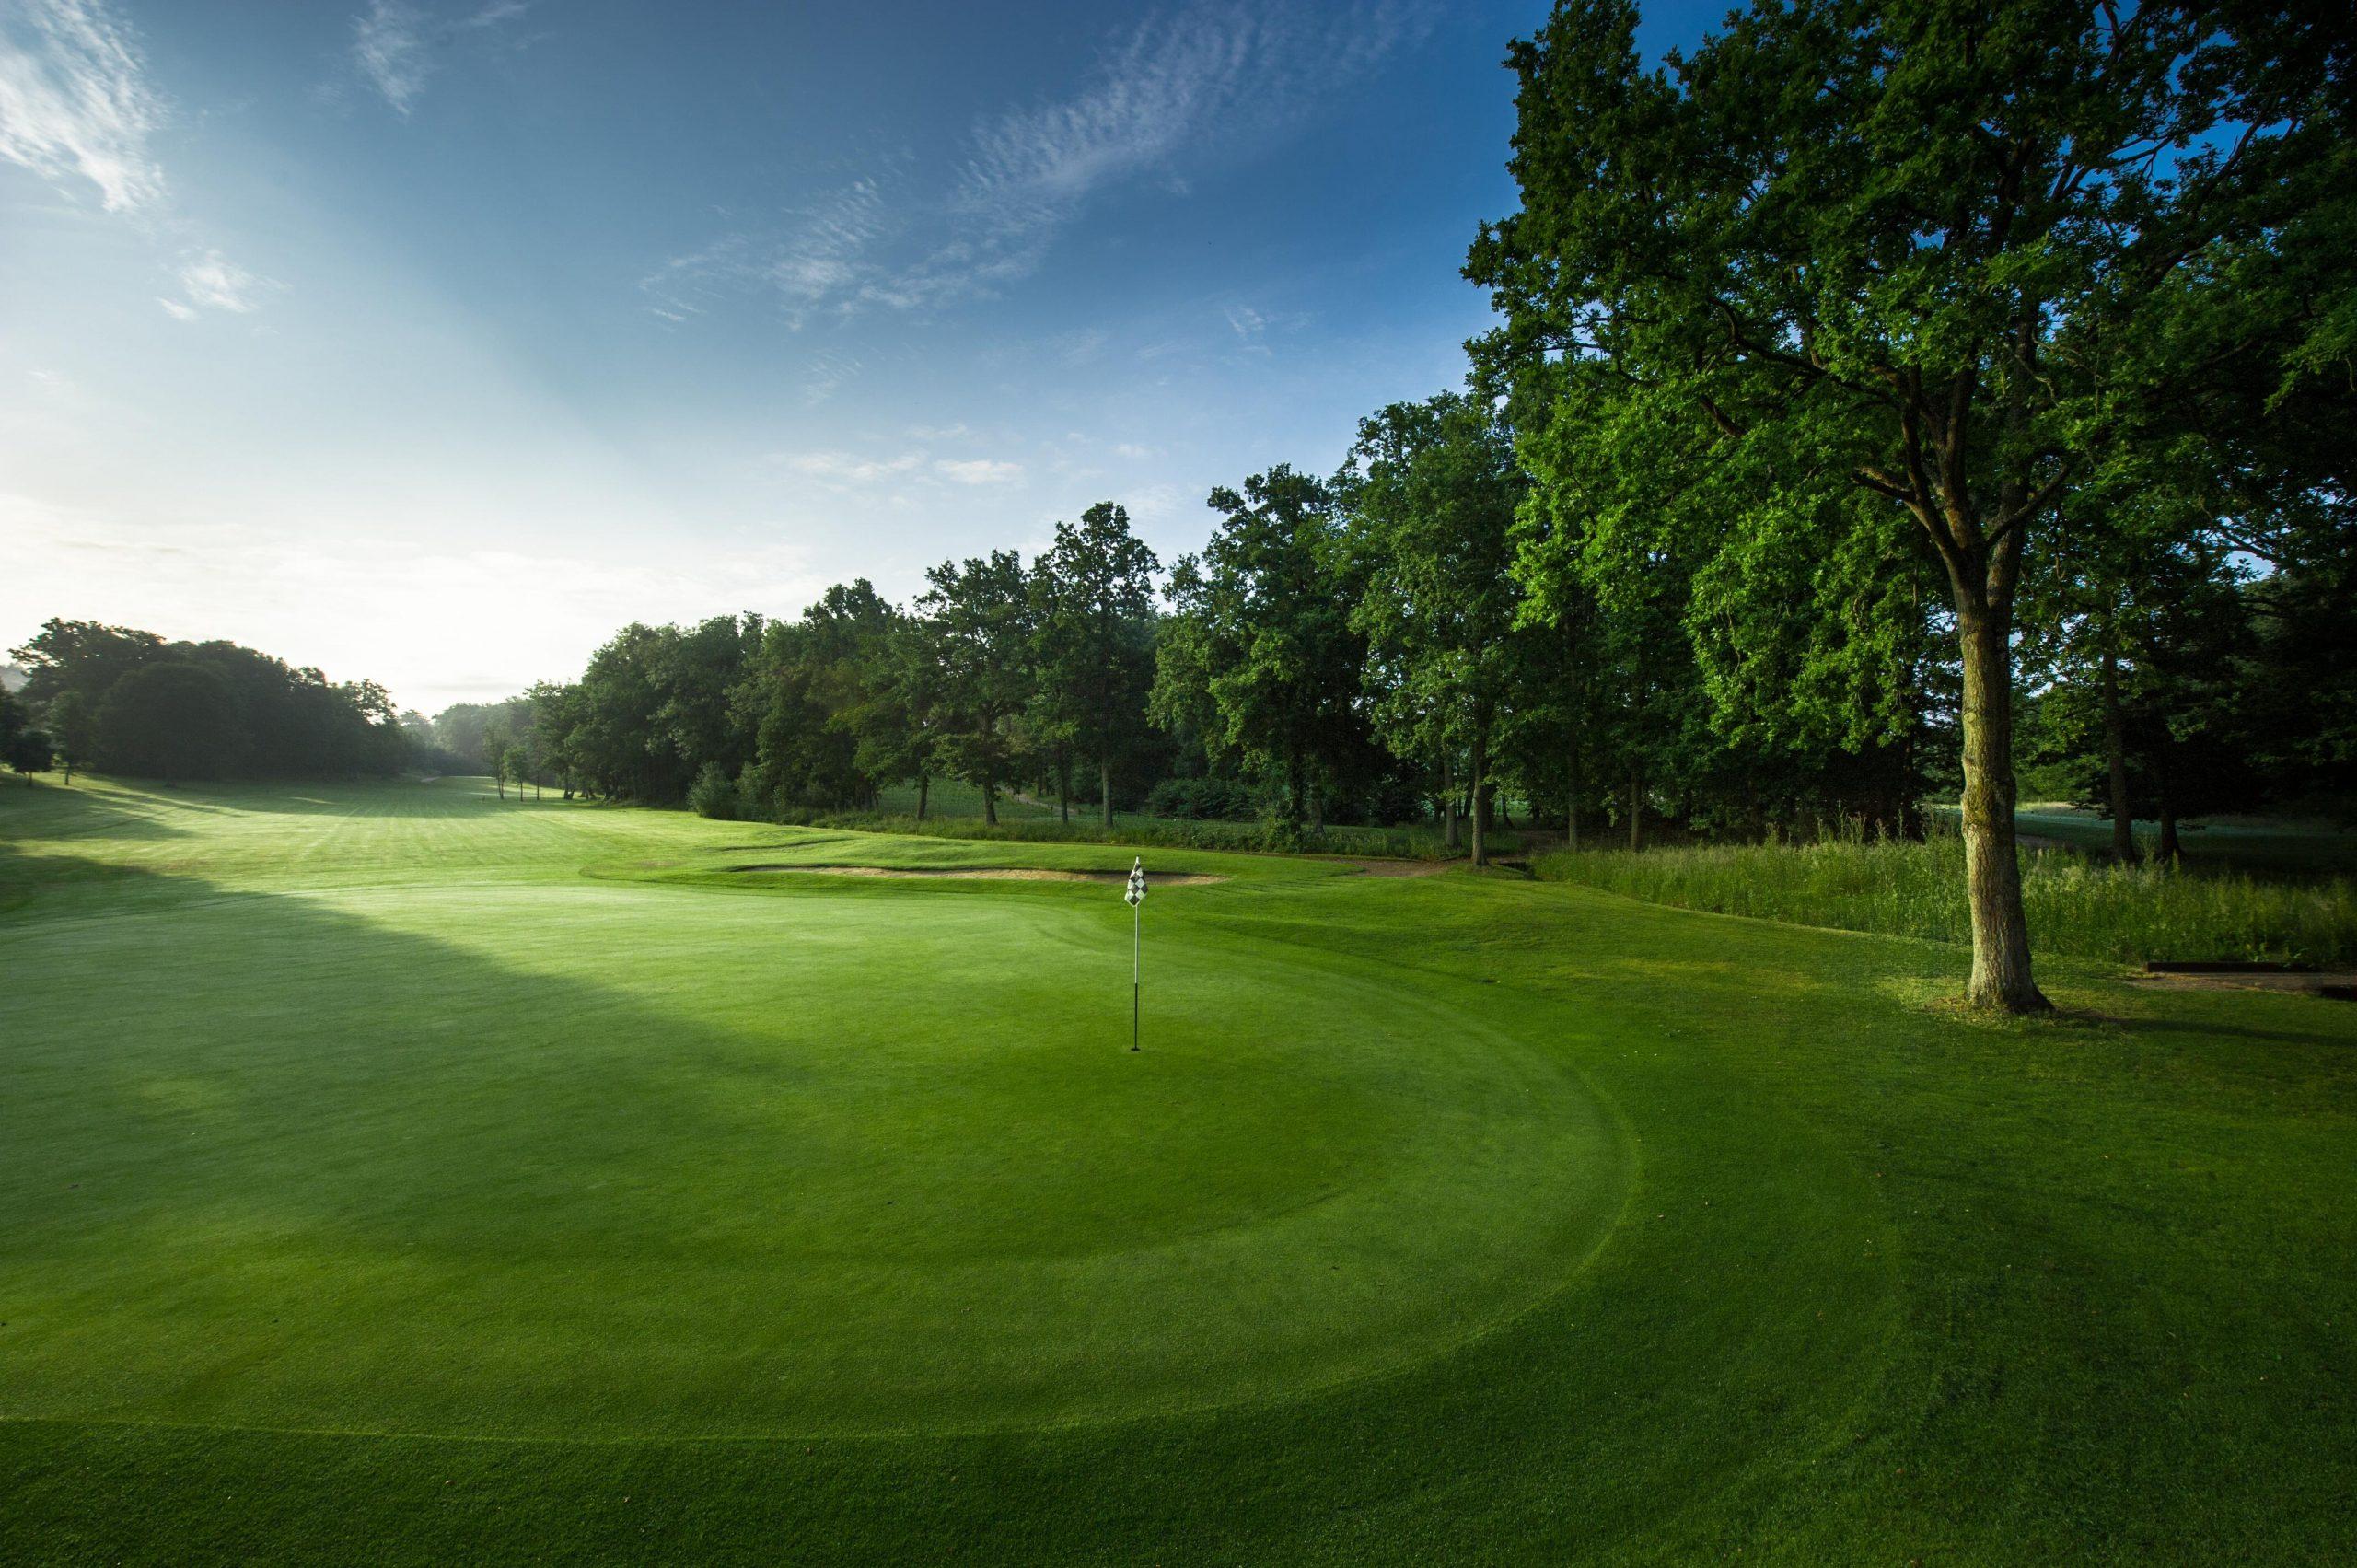 2021 IADC - OK/TX Panhandle Chapter 2021 Golf Tournament